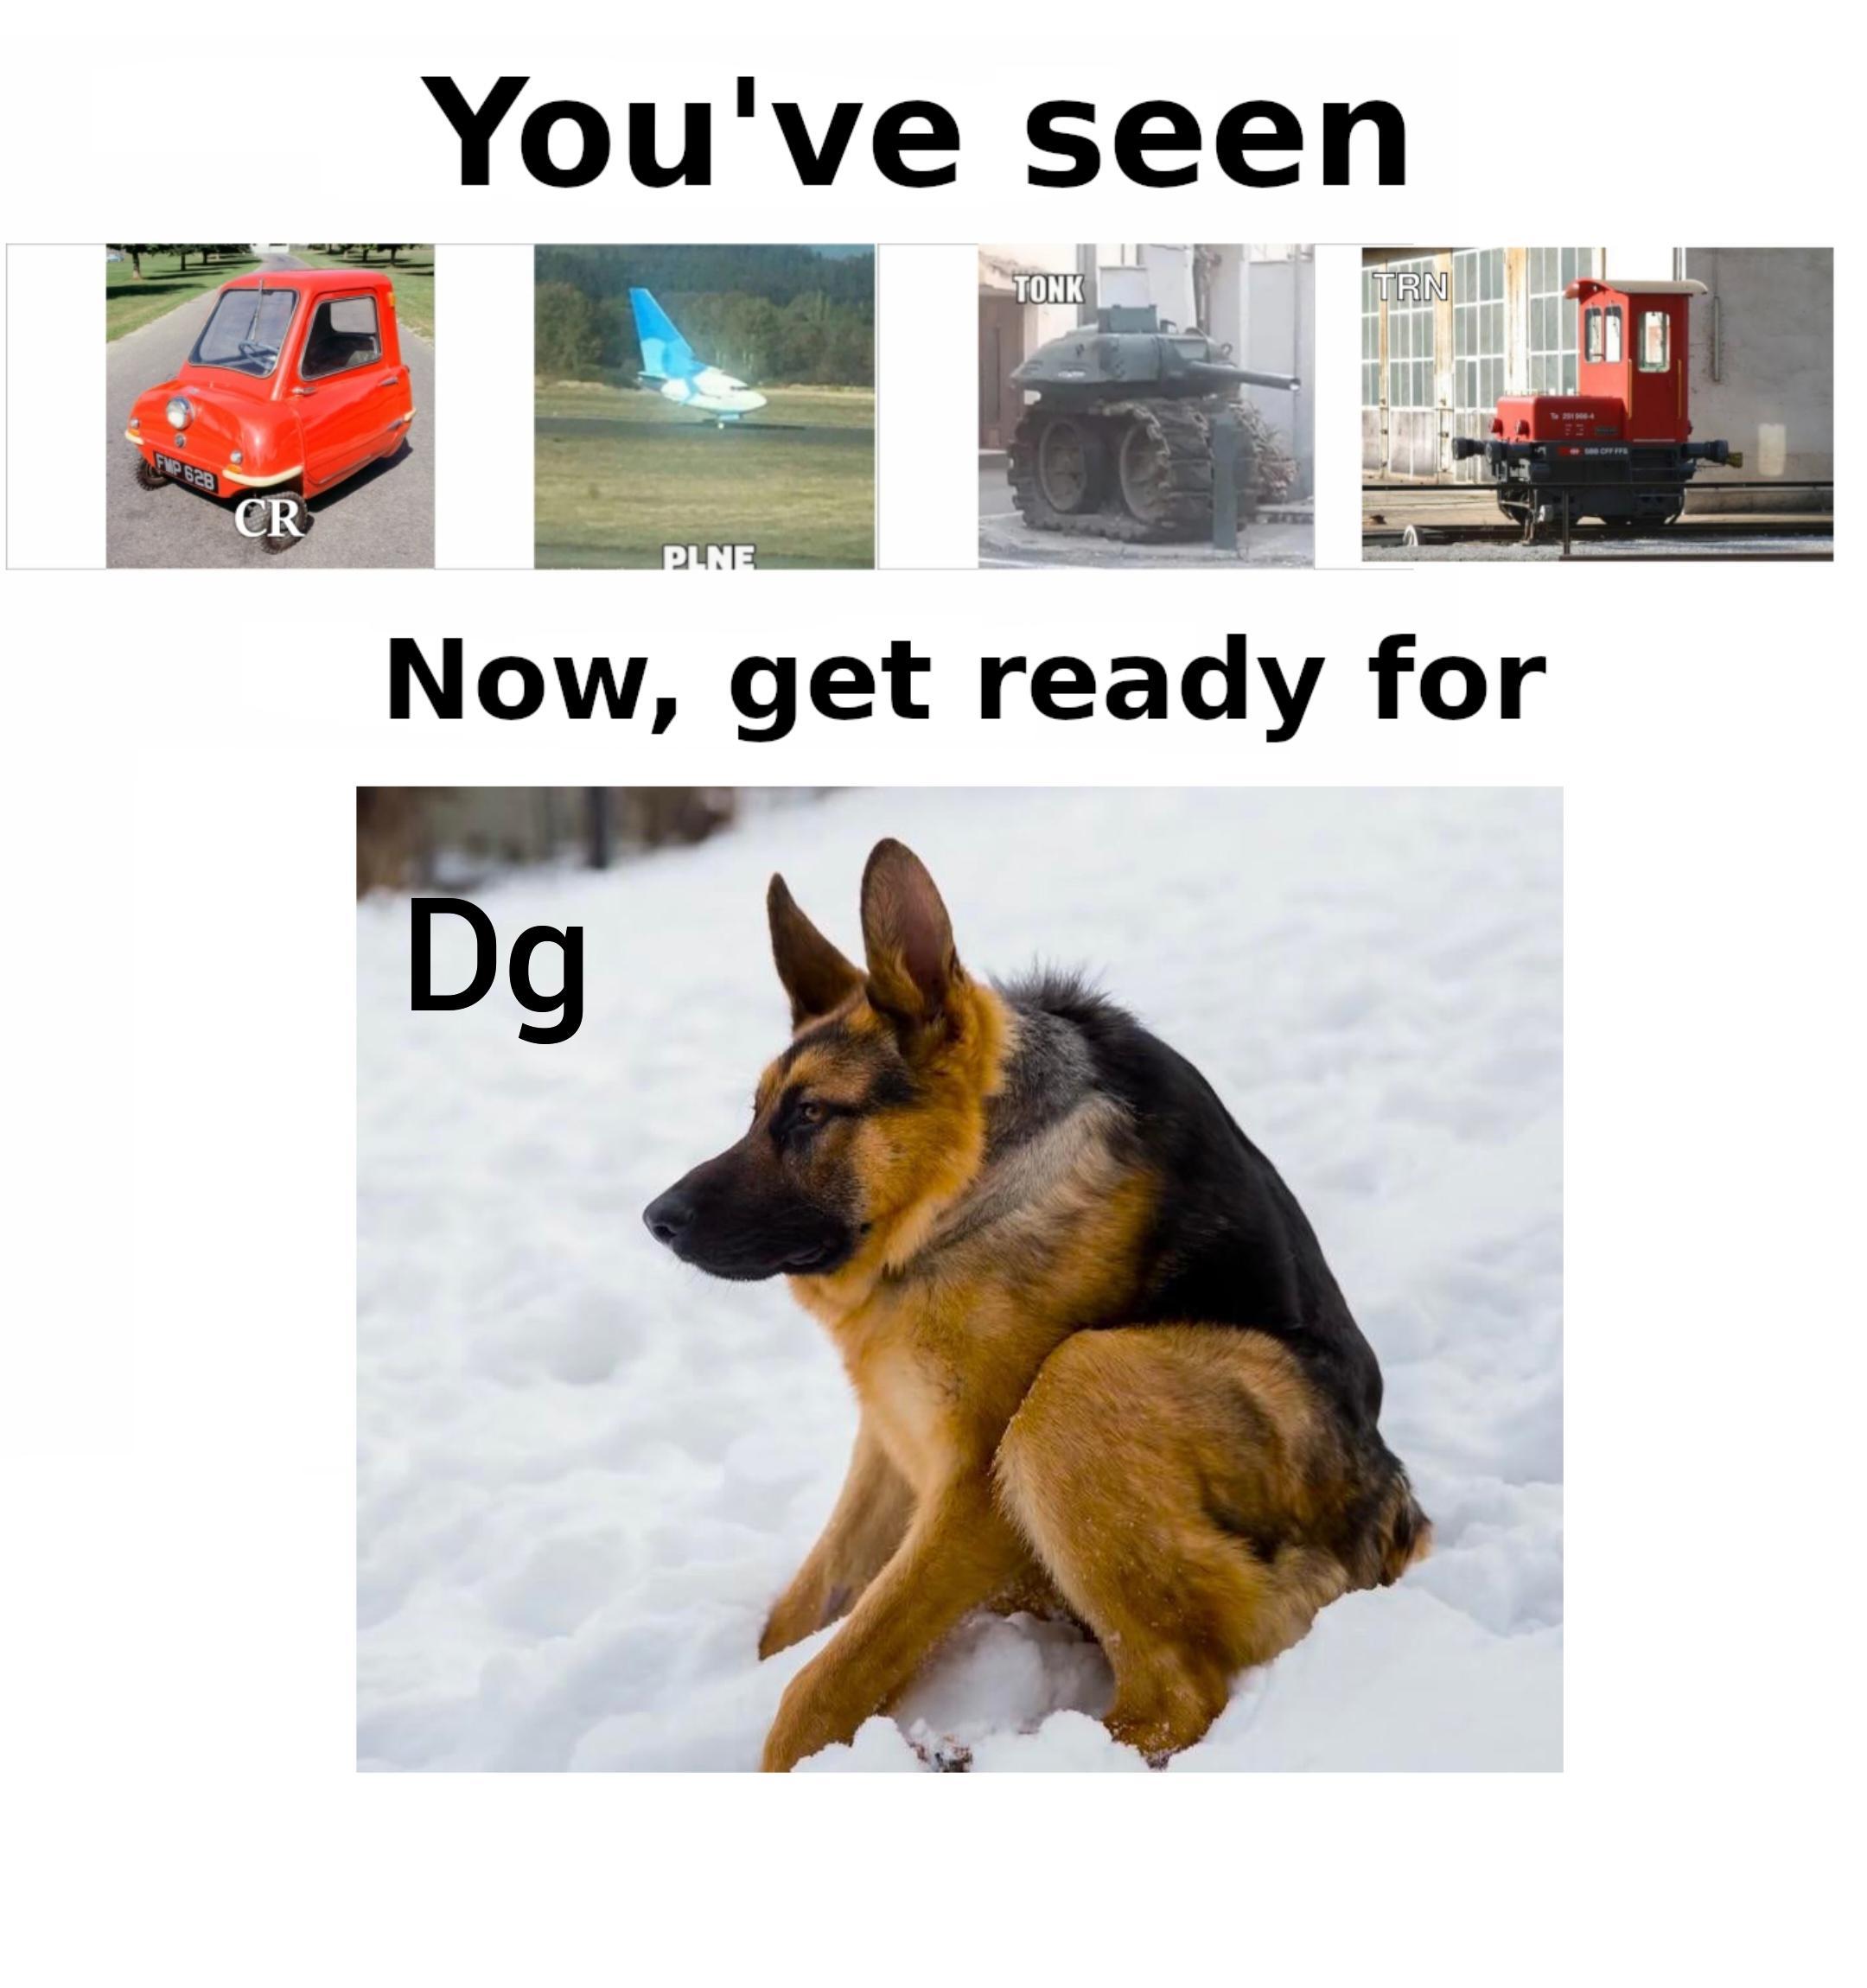 PI_GA meme gang